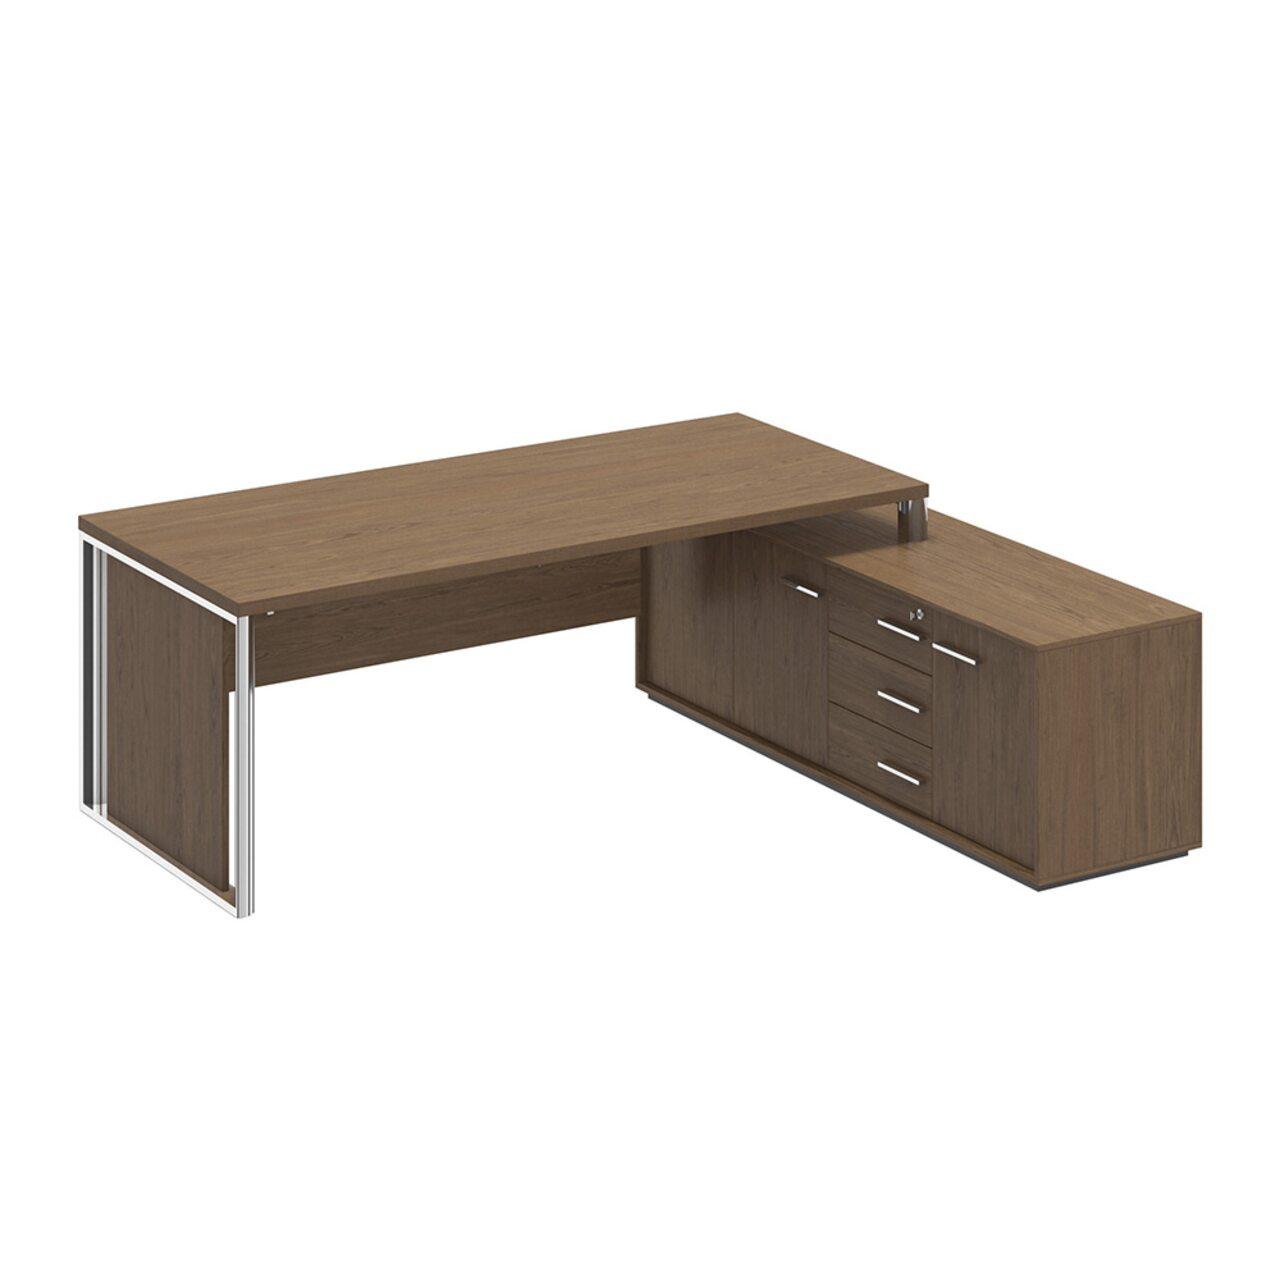 Стол руководителя на опорной тумбе правый с декоративной вставкой  ORION 222x180x75 - фото 1